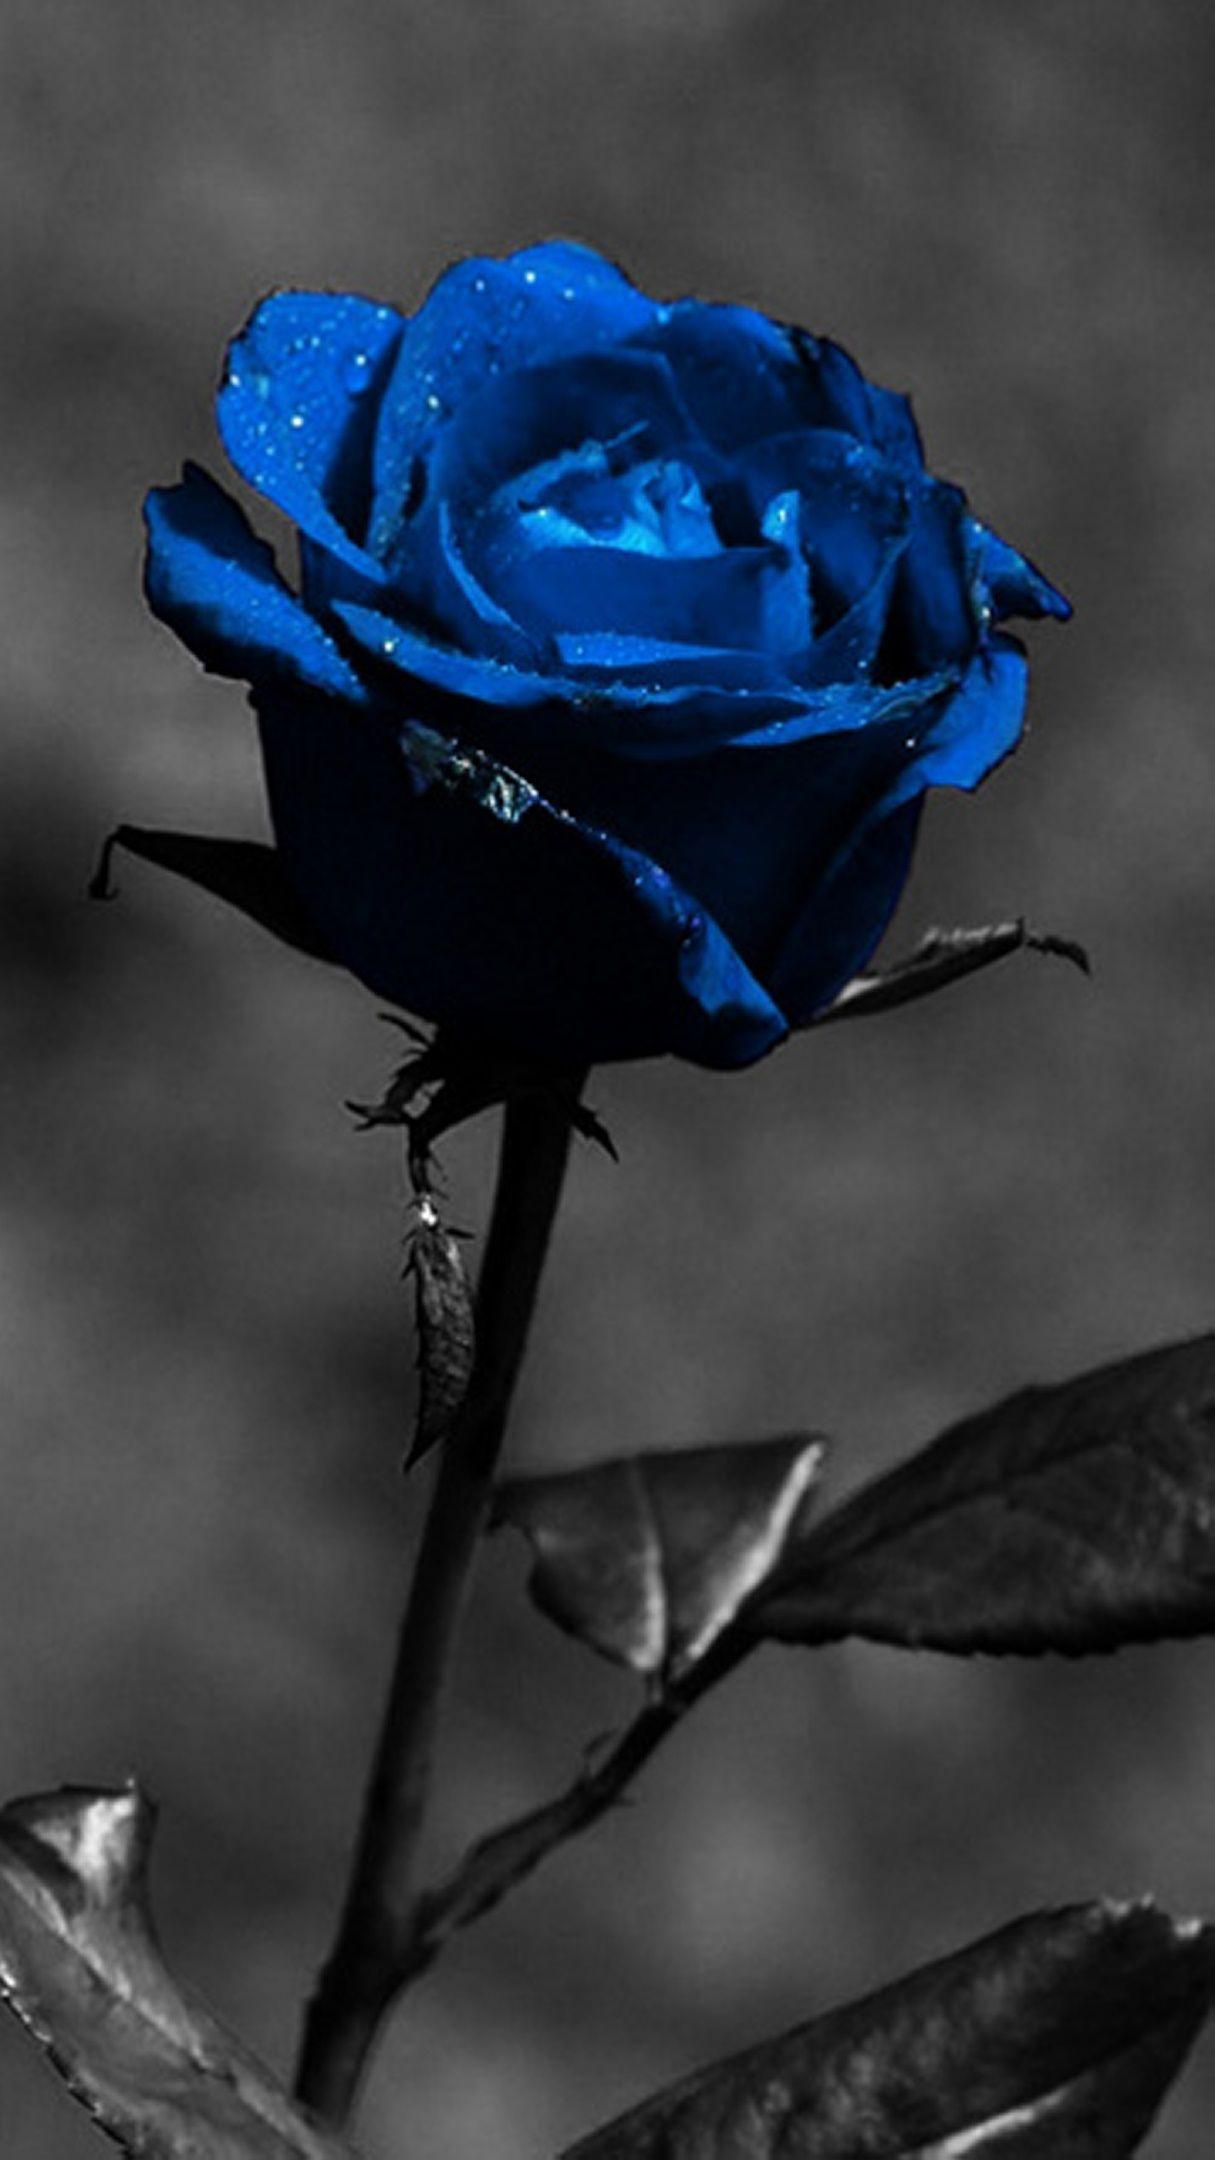 iphone xs wallpaper 4k خلفيات ايفون xs Blue roses